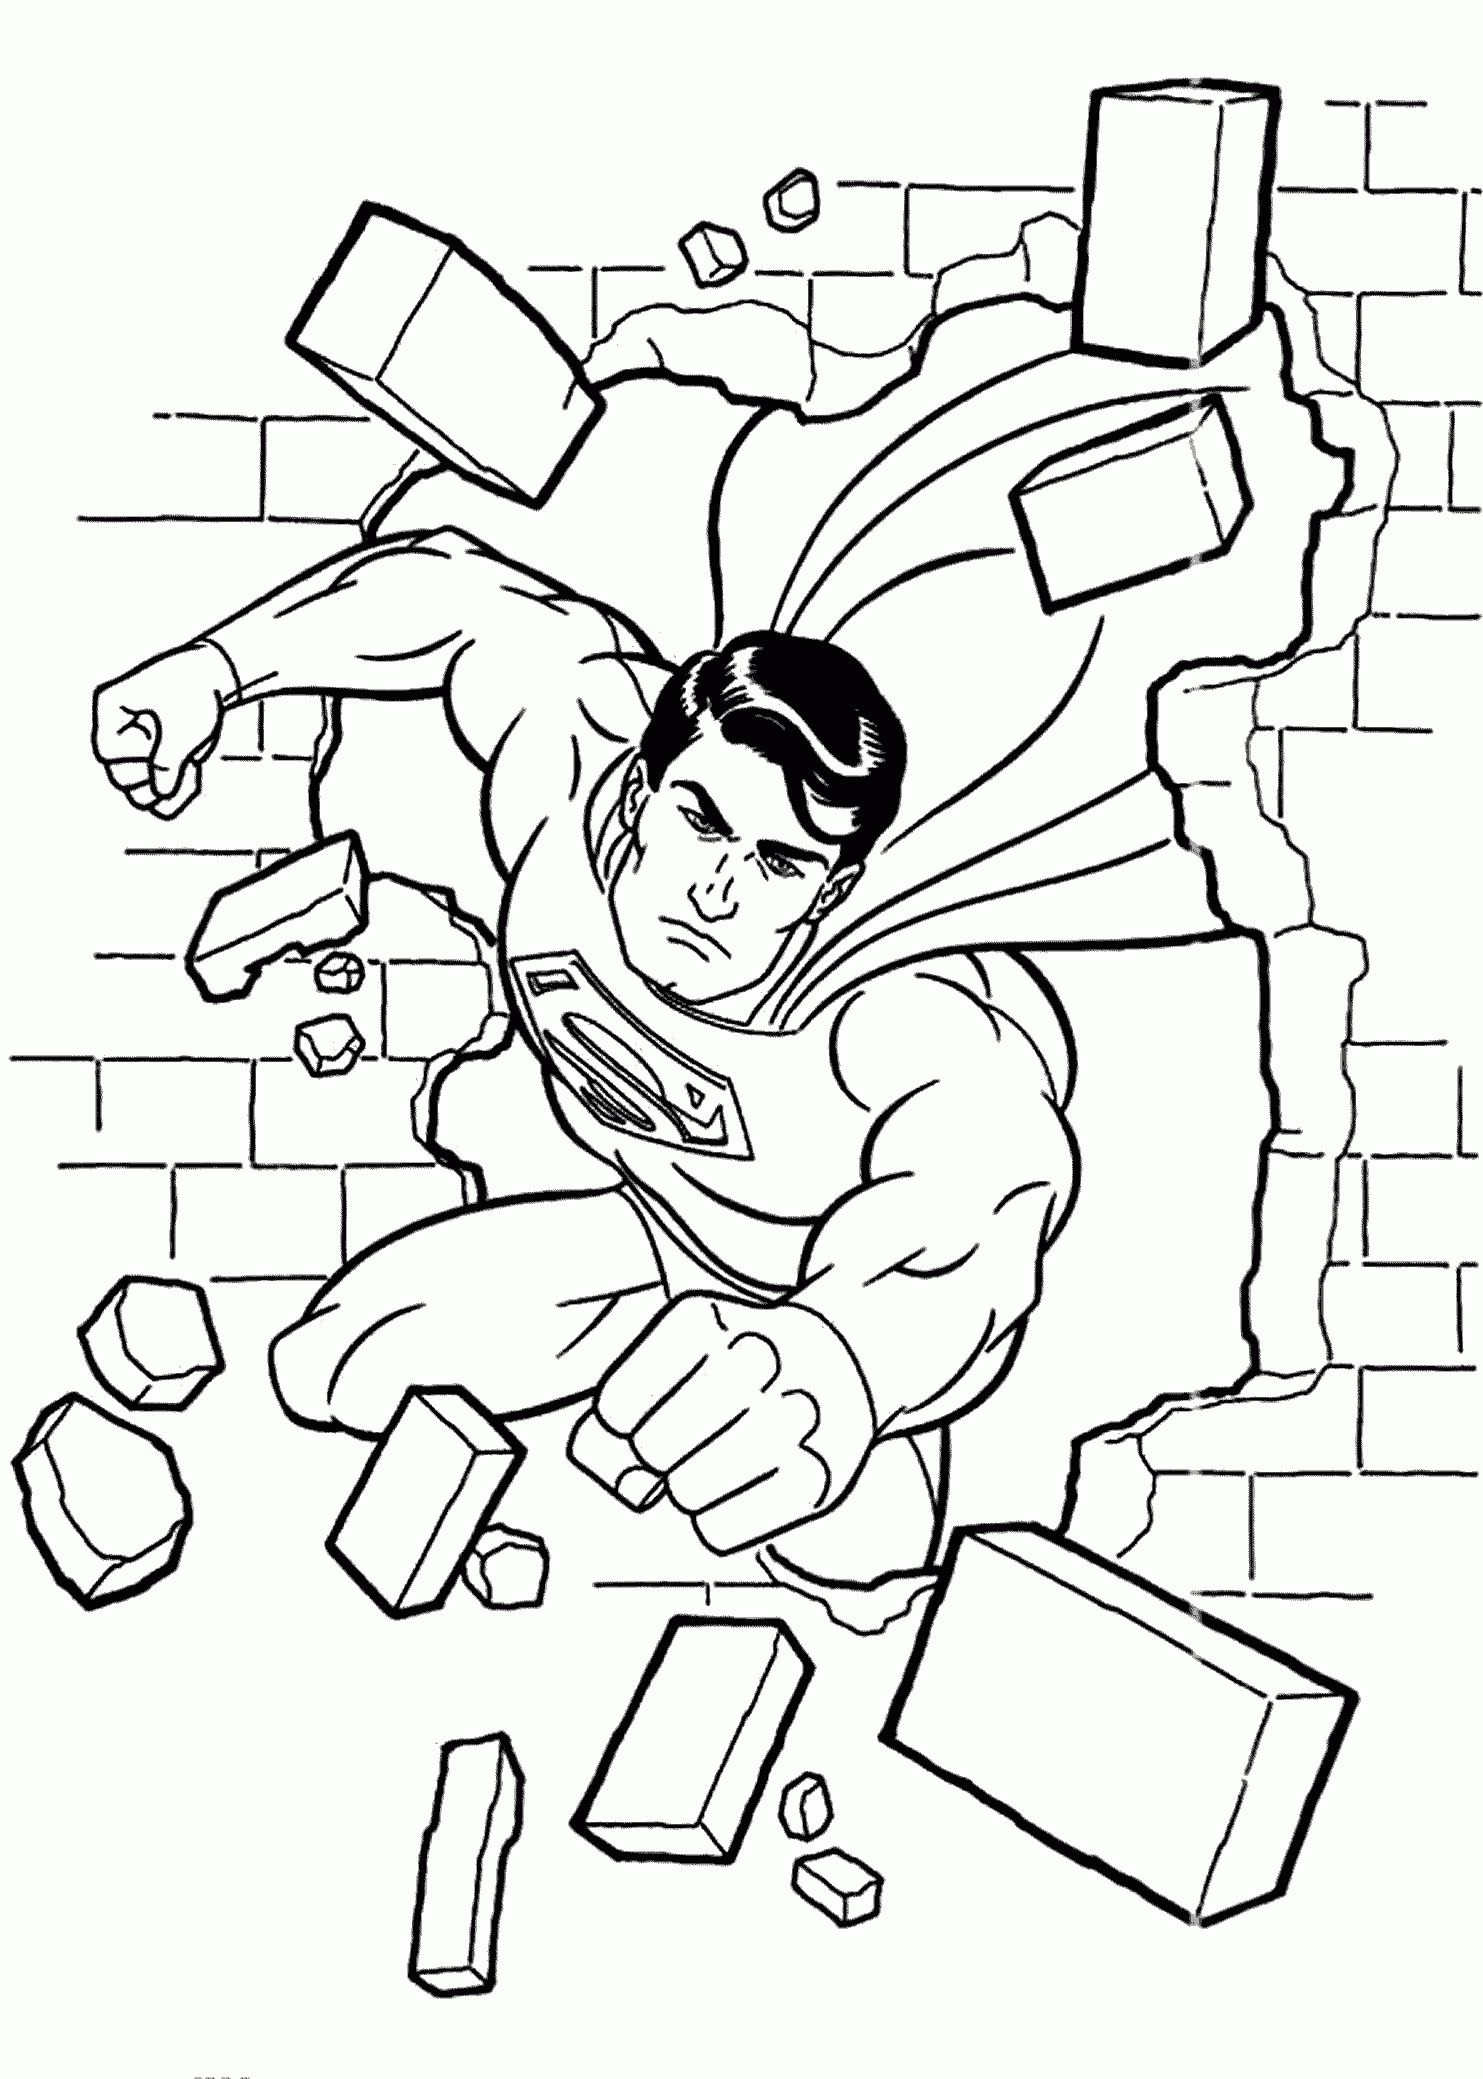 Superman Christmas Coloring Pages Superman Christmas Coloring Pages Superhelden Malvorlagen Ausmalbilder Ausmalbilder Kinder